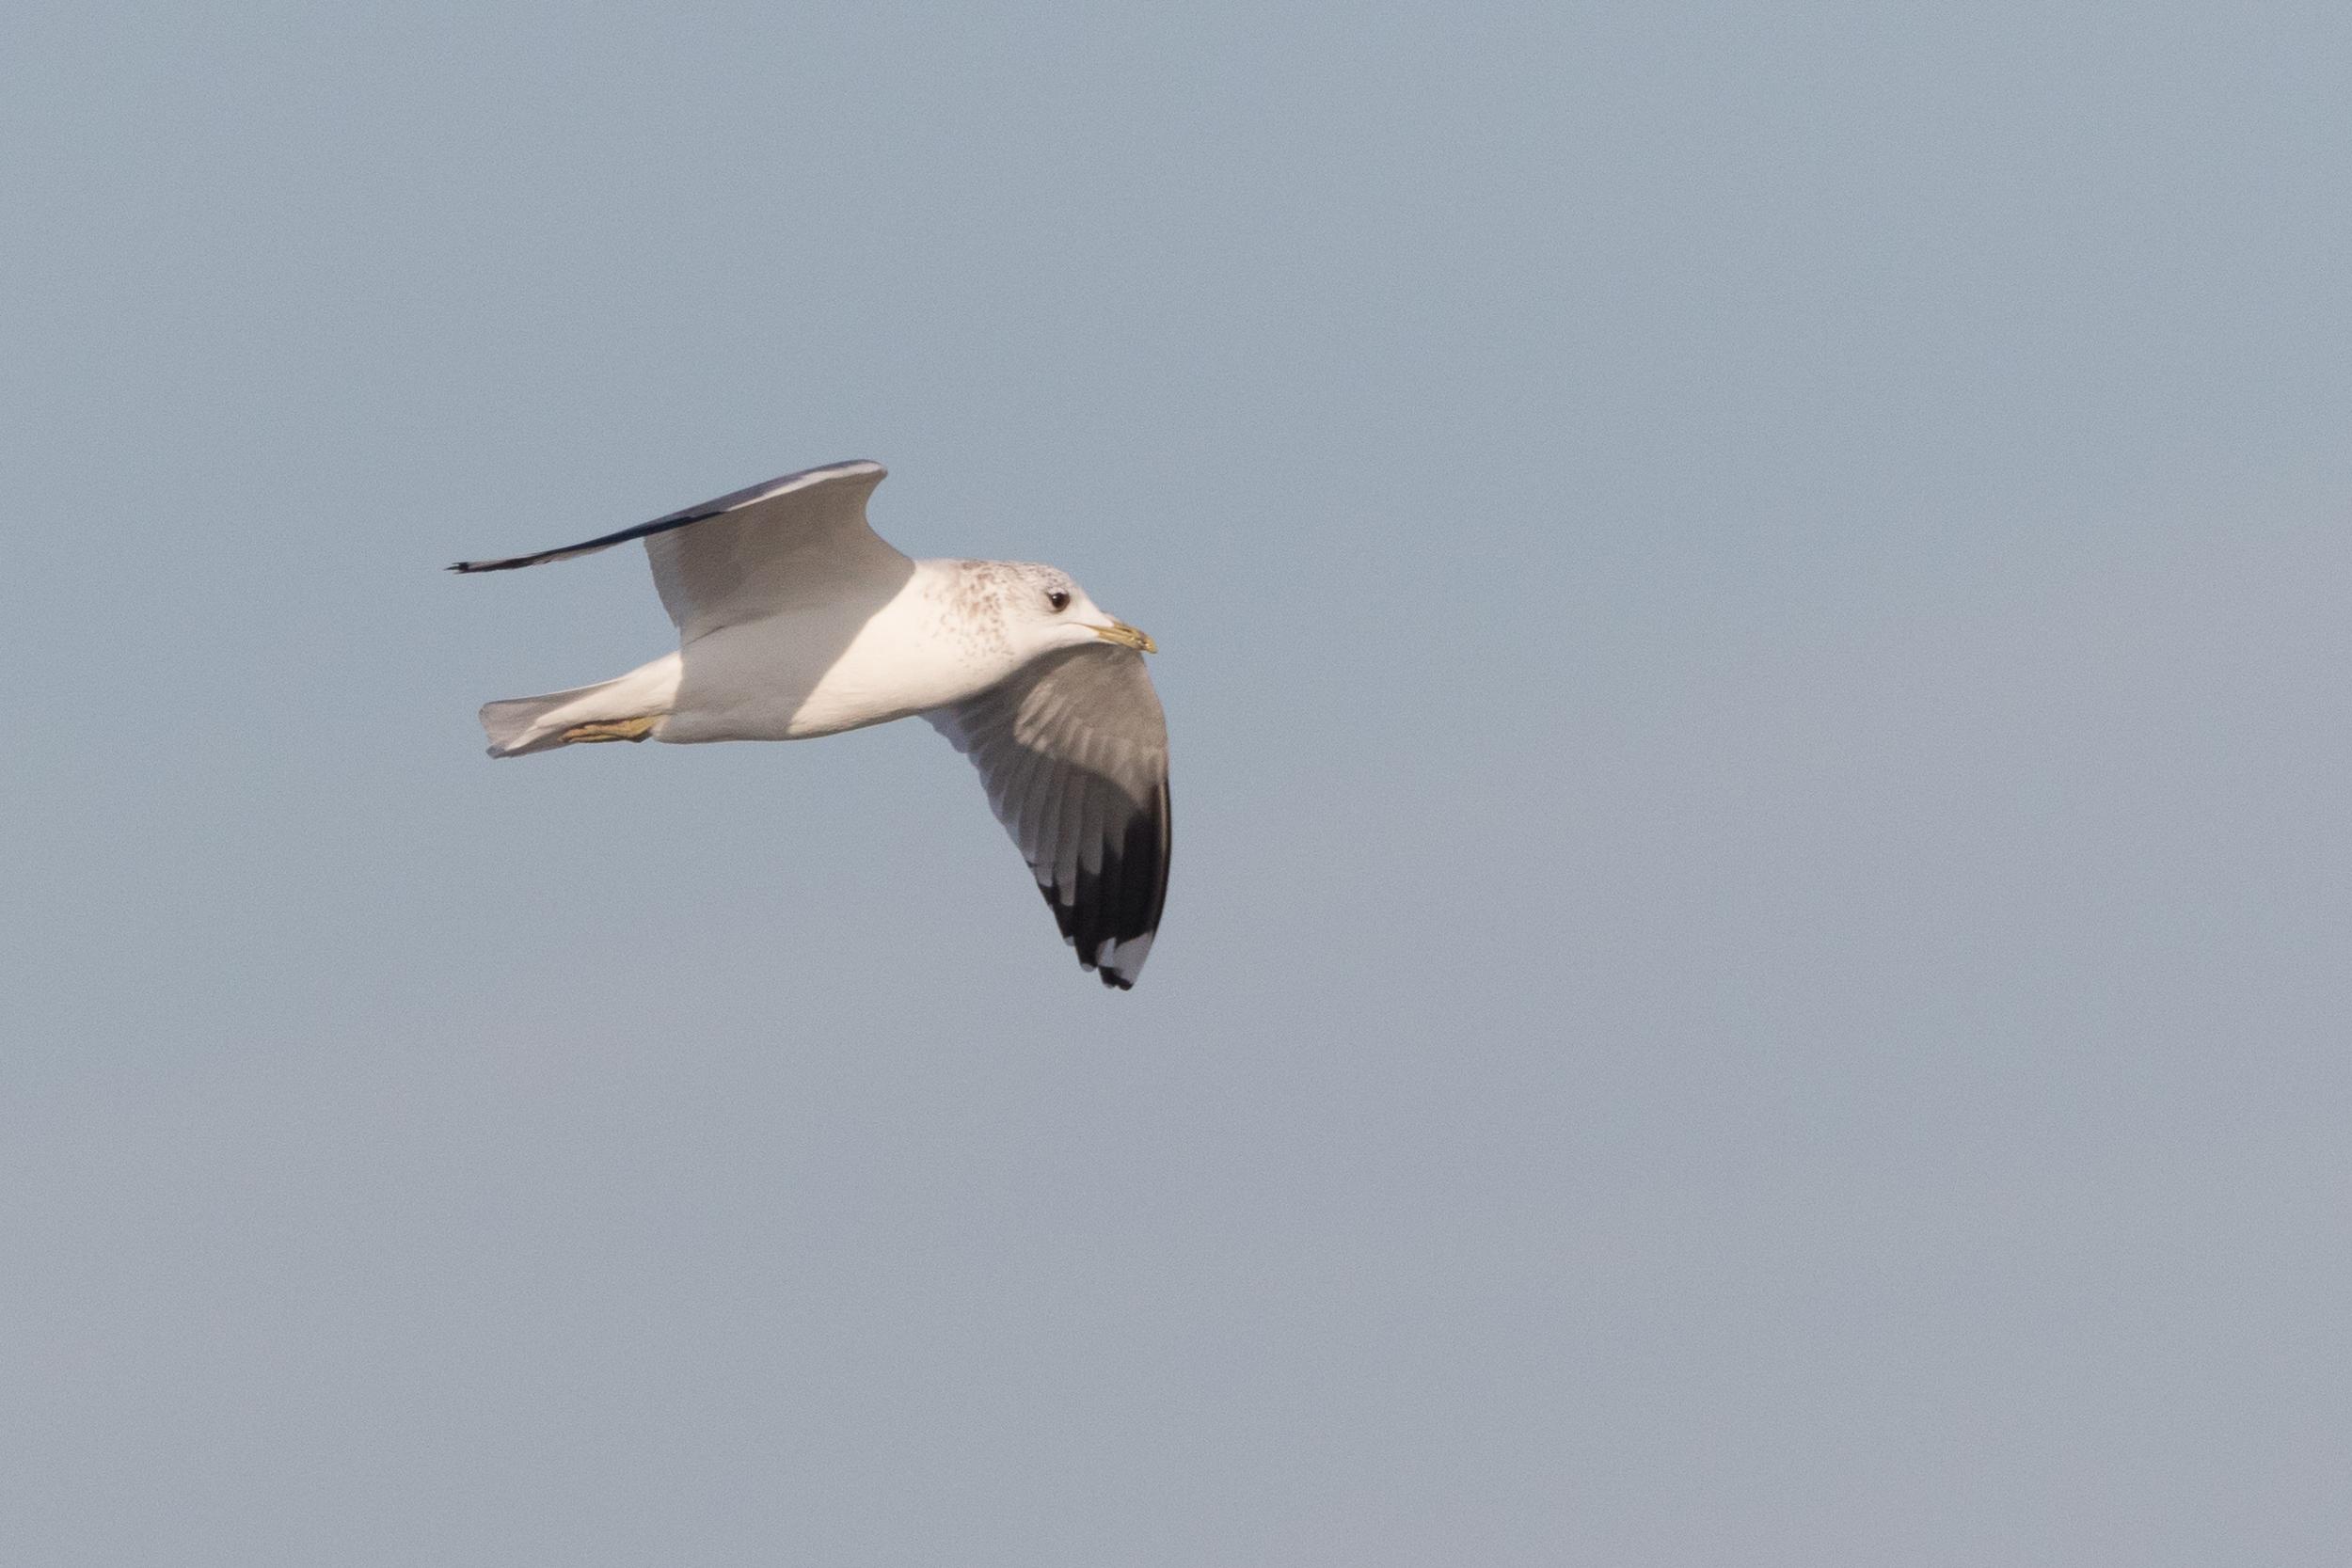 20170121-Common Gull Adult-49.jpg